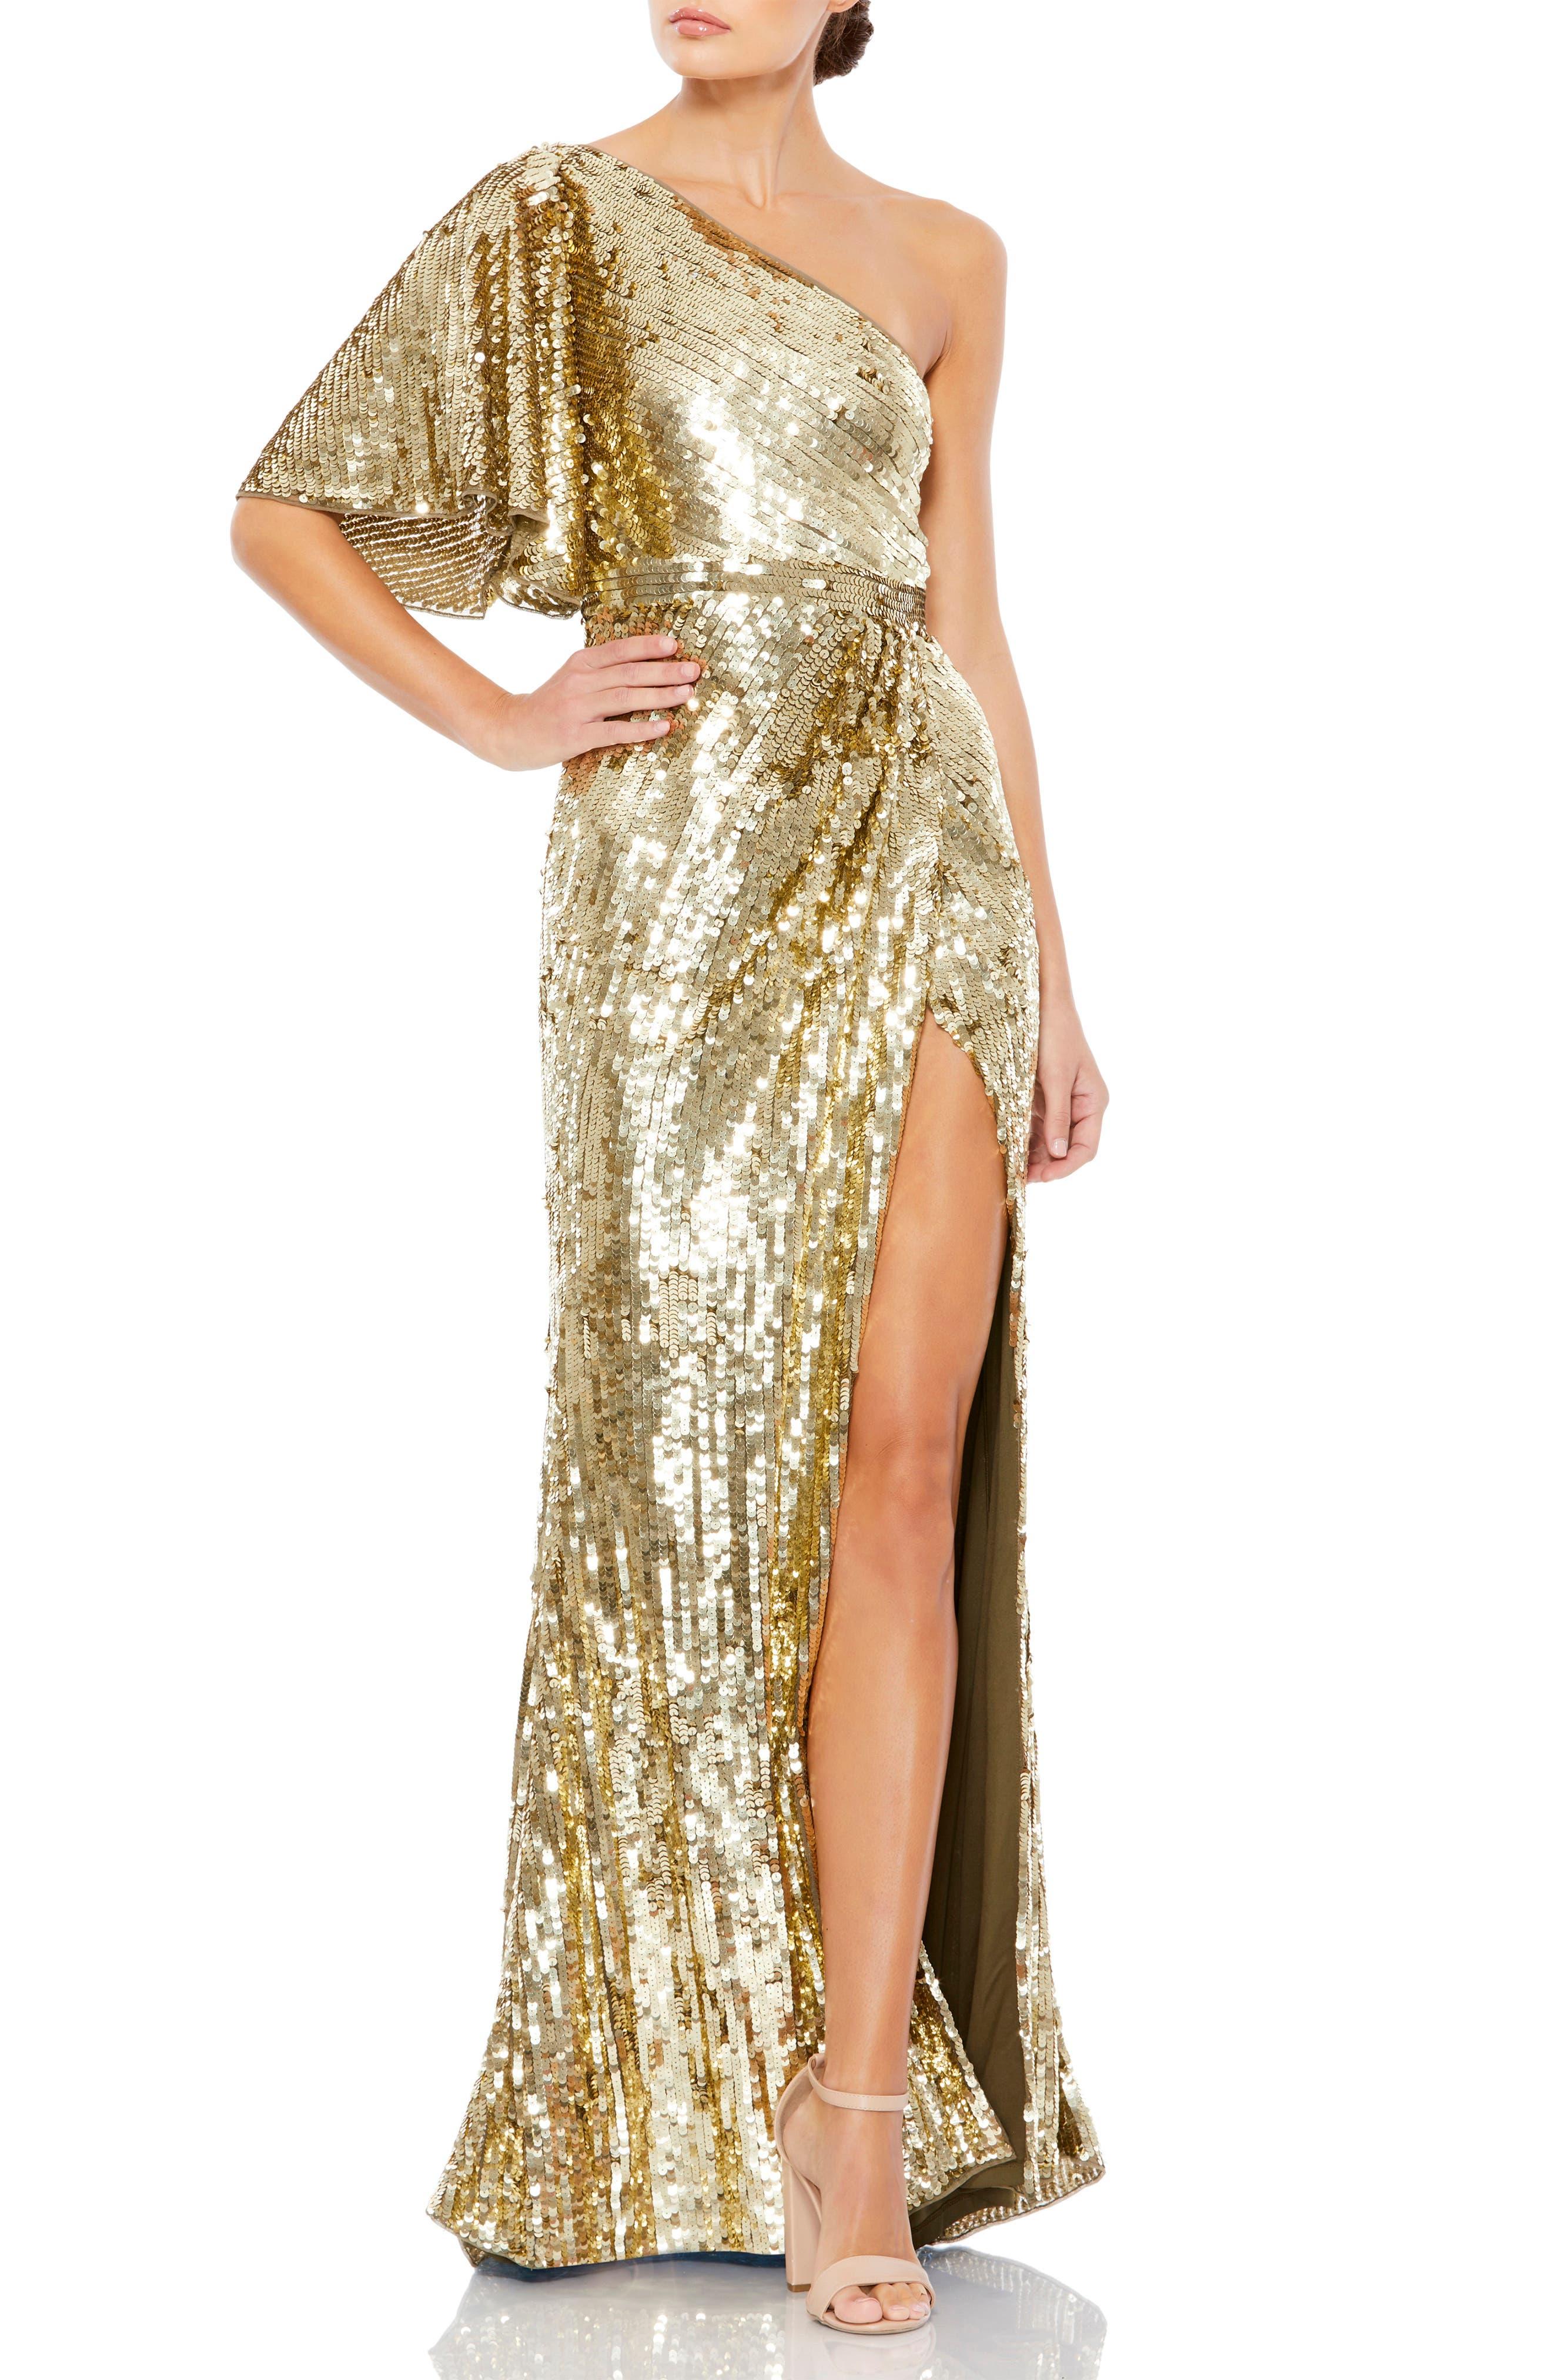 70s Sequin Dresses, Disco Dresses Womens MAC Duggal One-Shoulder Sequin Column Gown Size 12 - Metallic $598.00 AT vintagedancer.com